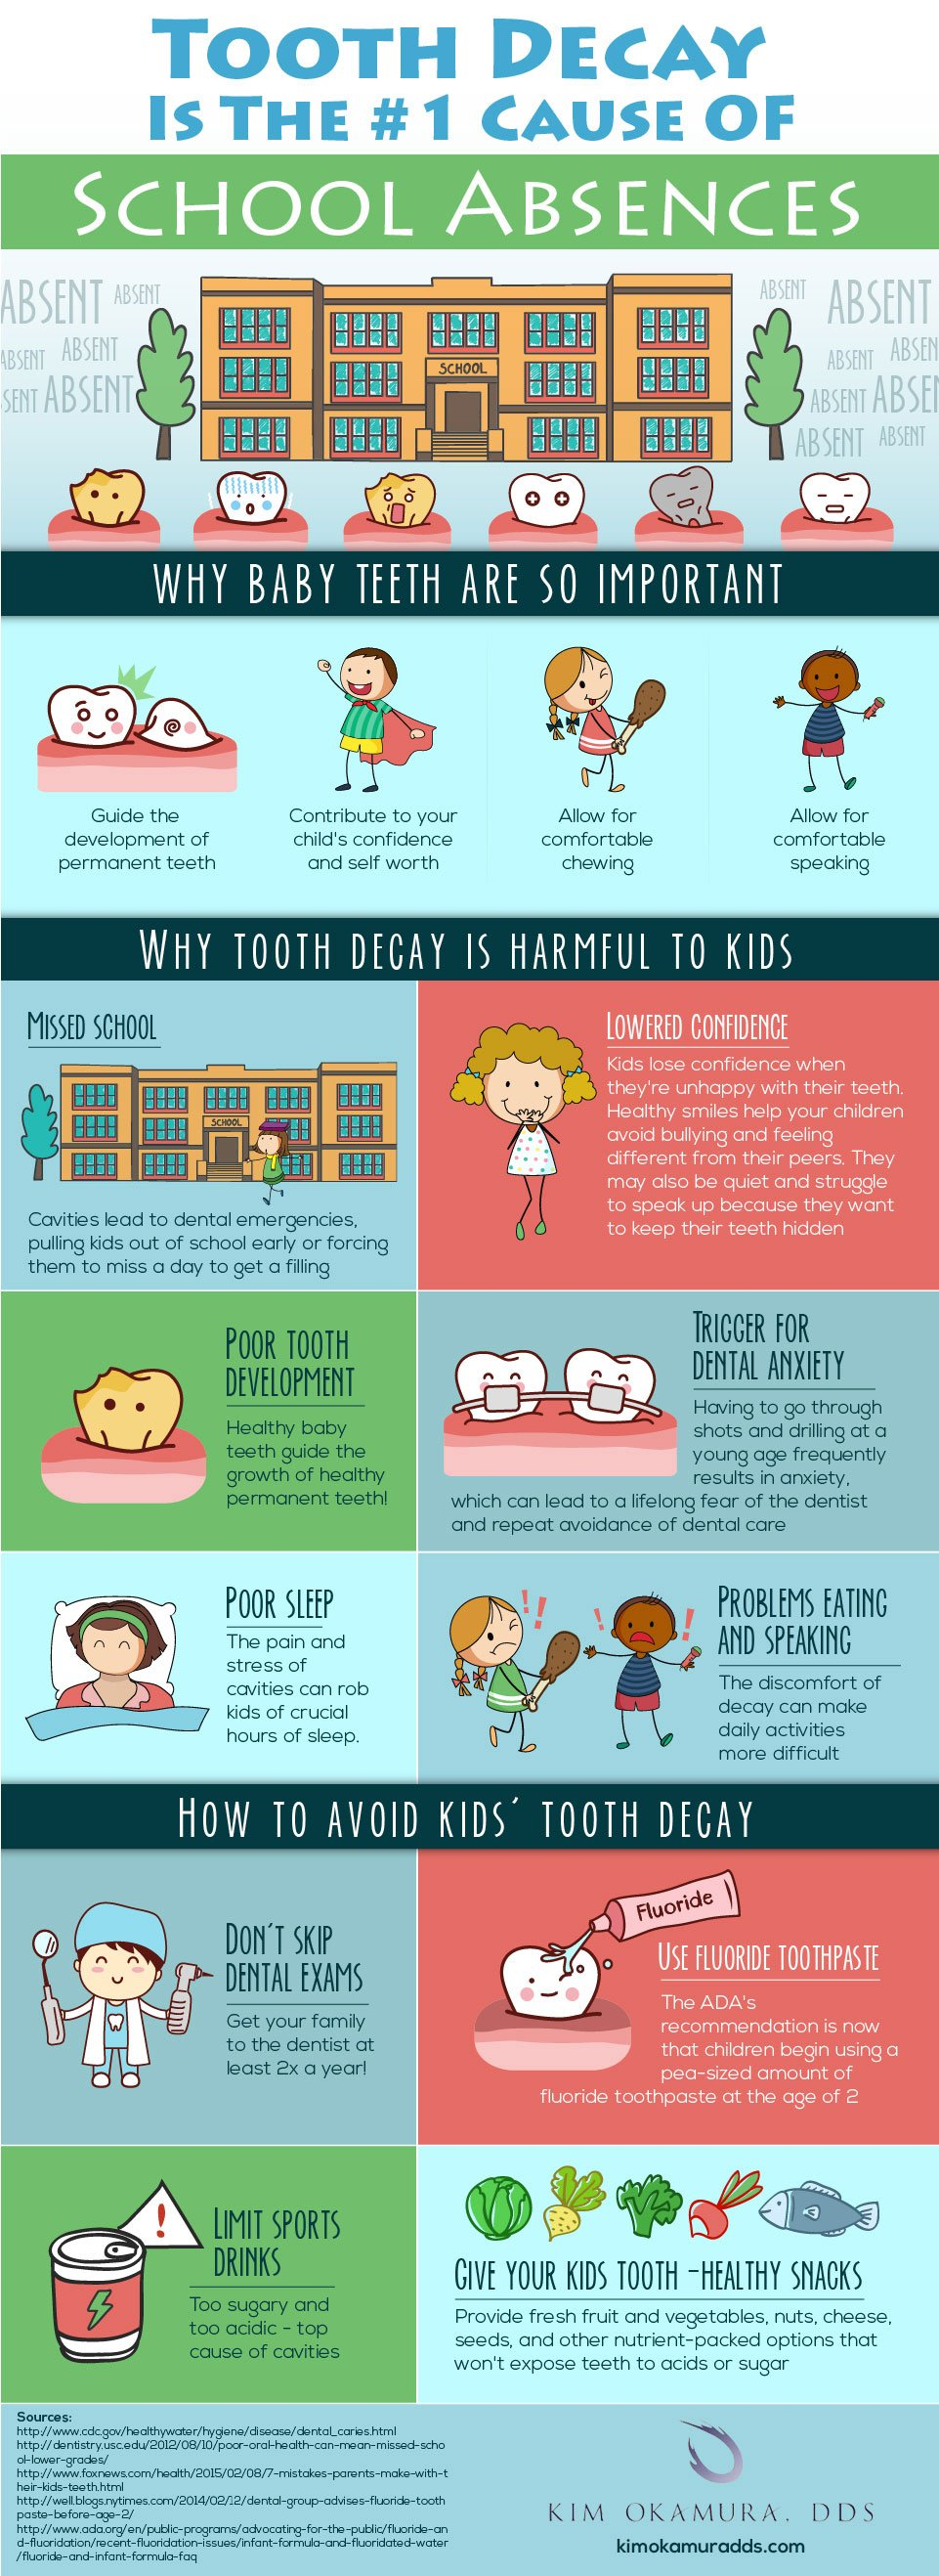 avoiding-tooth-decay